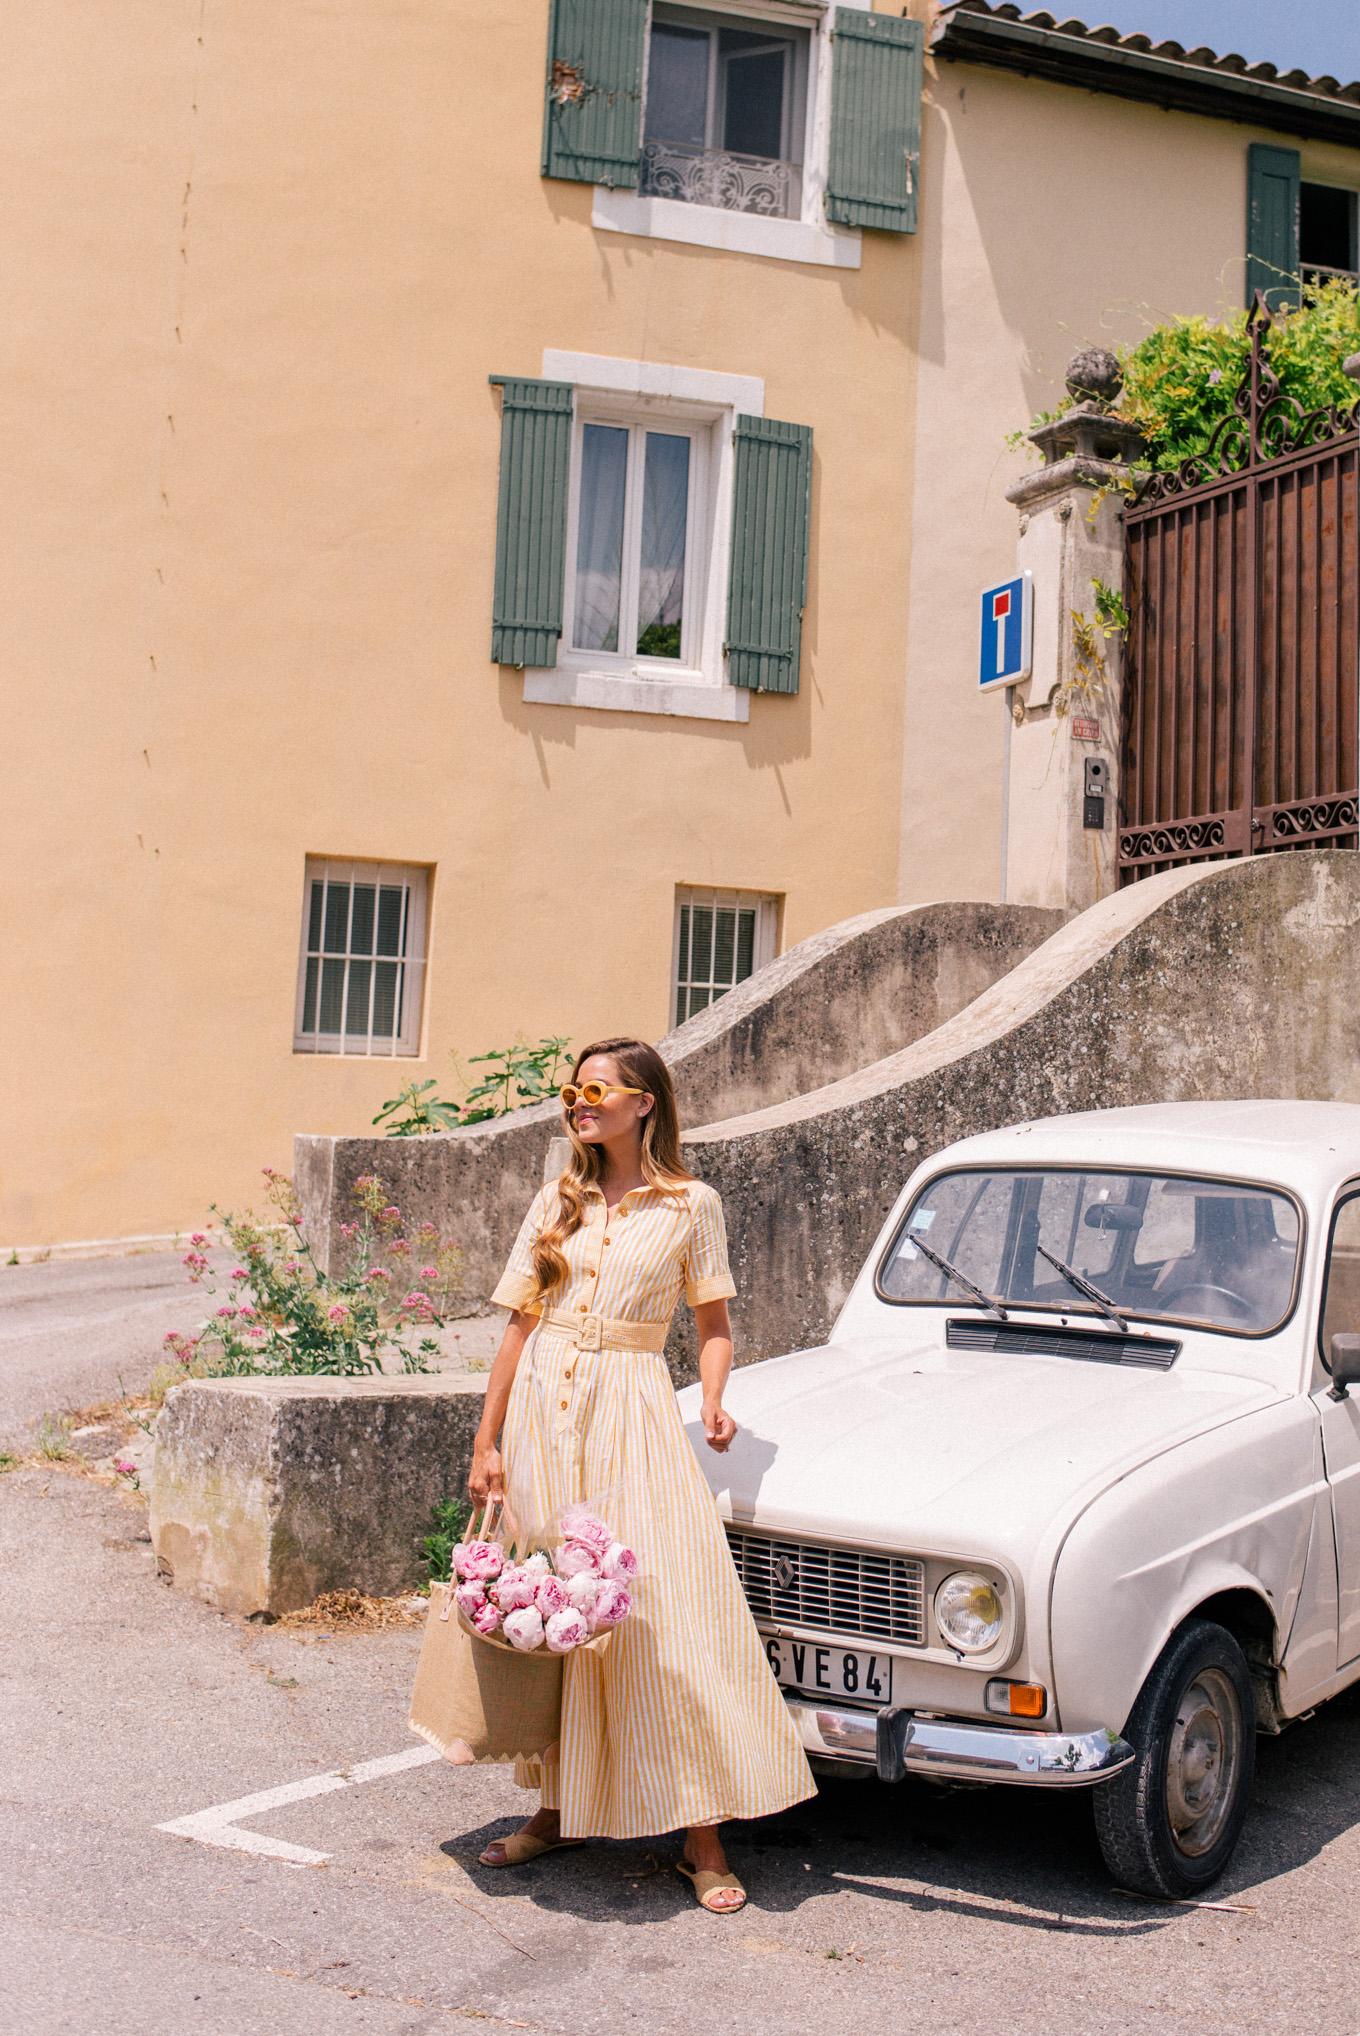 gmg-provence-market-apt-1007546